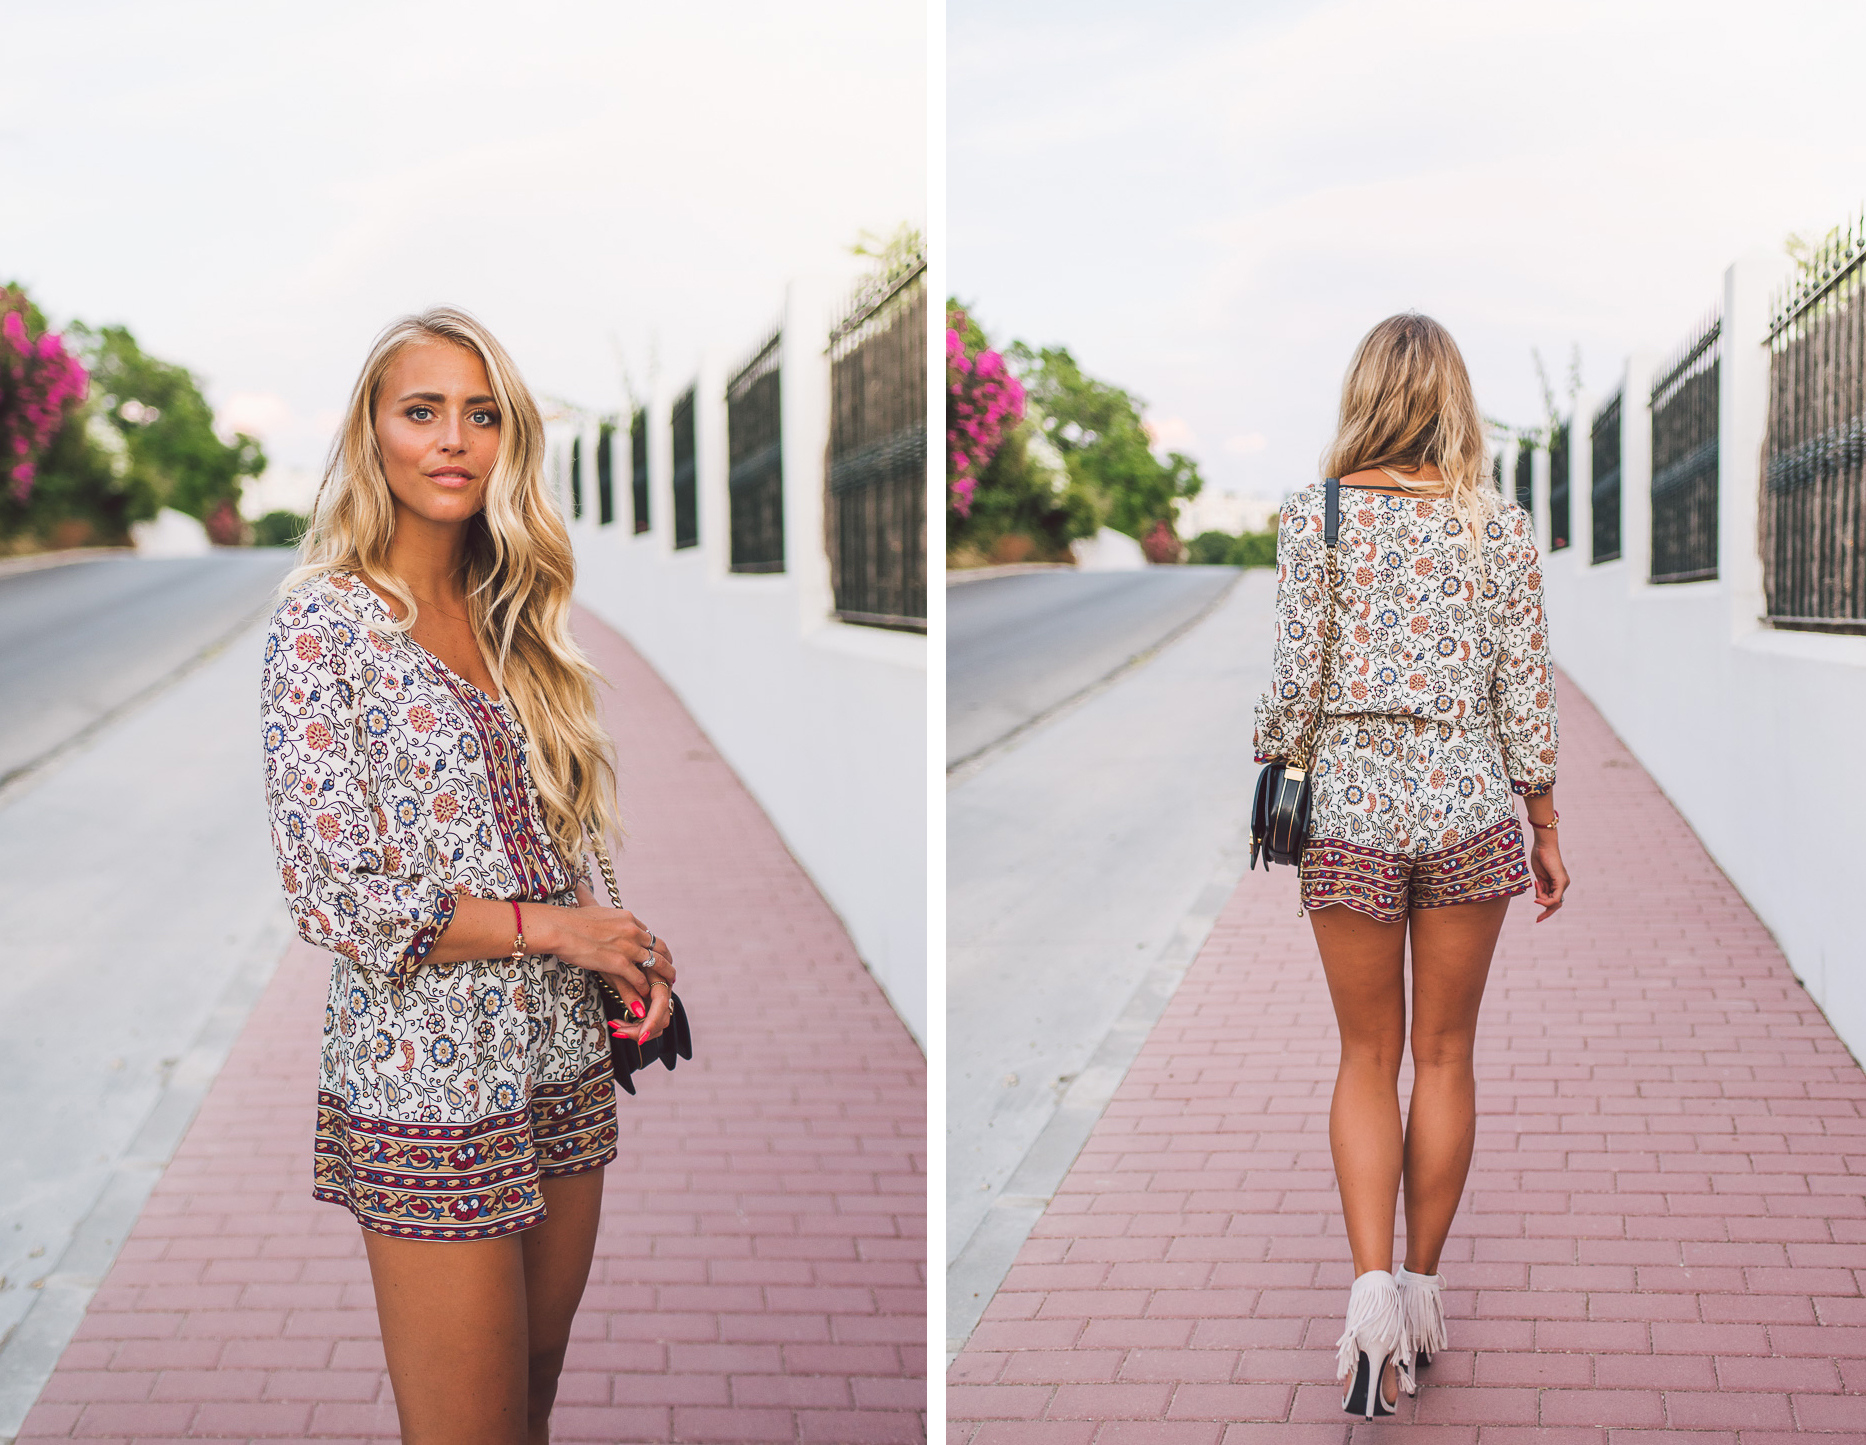 janni-deler-fringed-heels-bohemic-jumpsuit-outfitDSC_4677ff